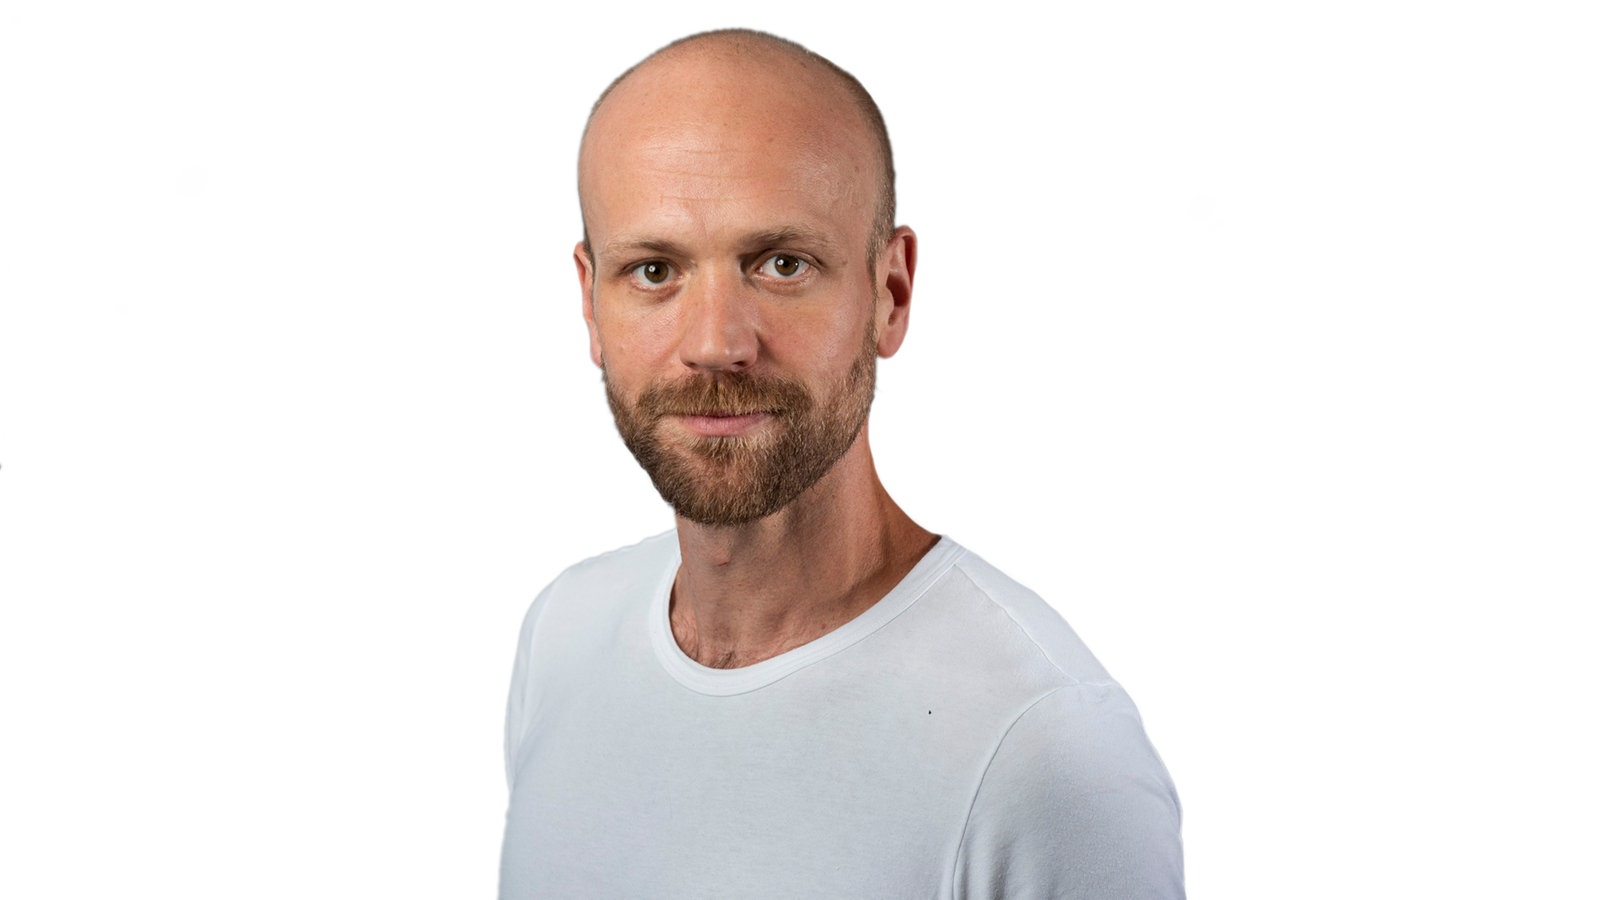 Klausi Beimer